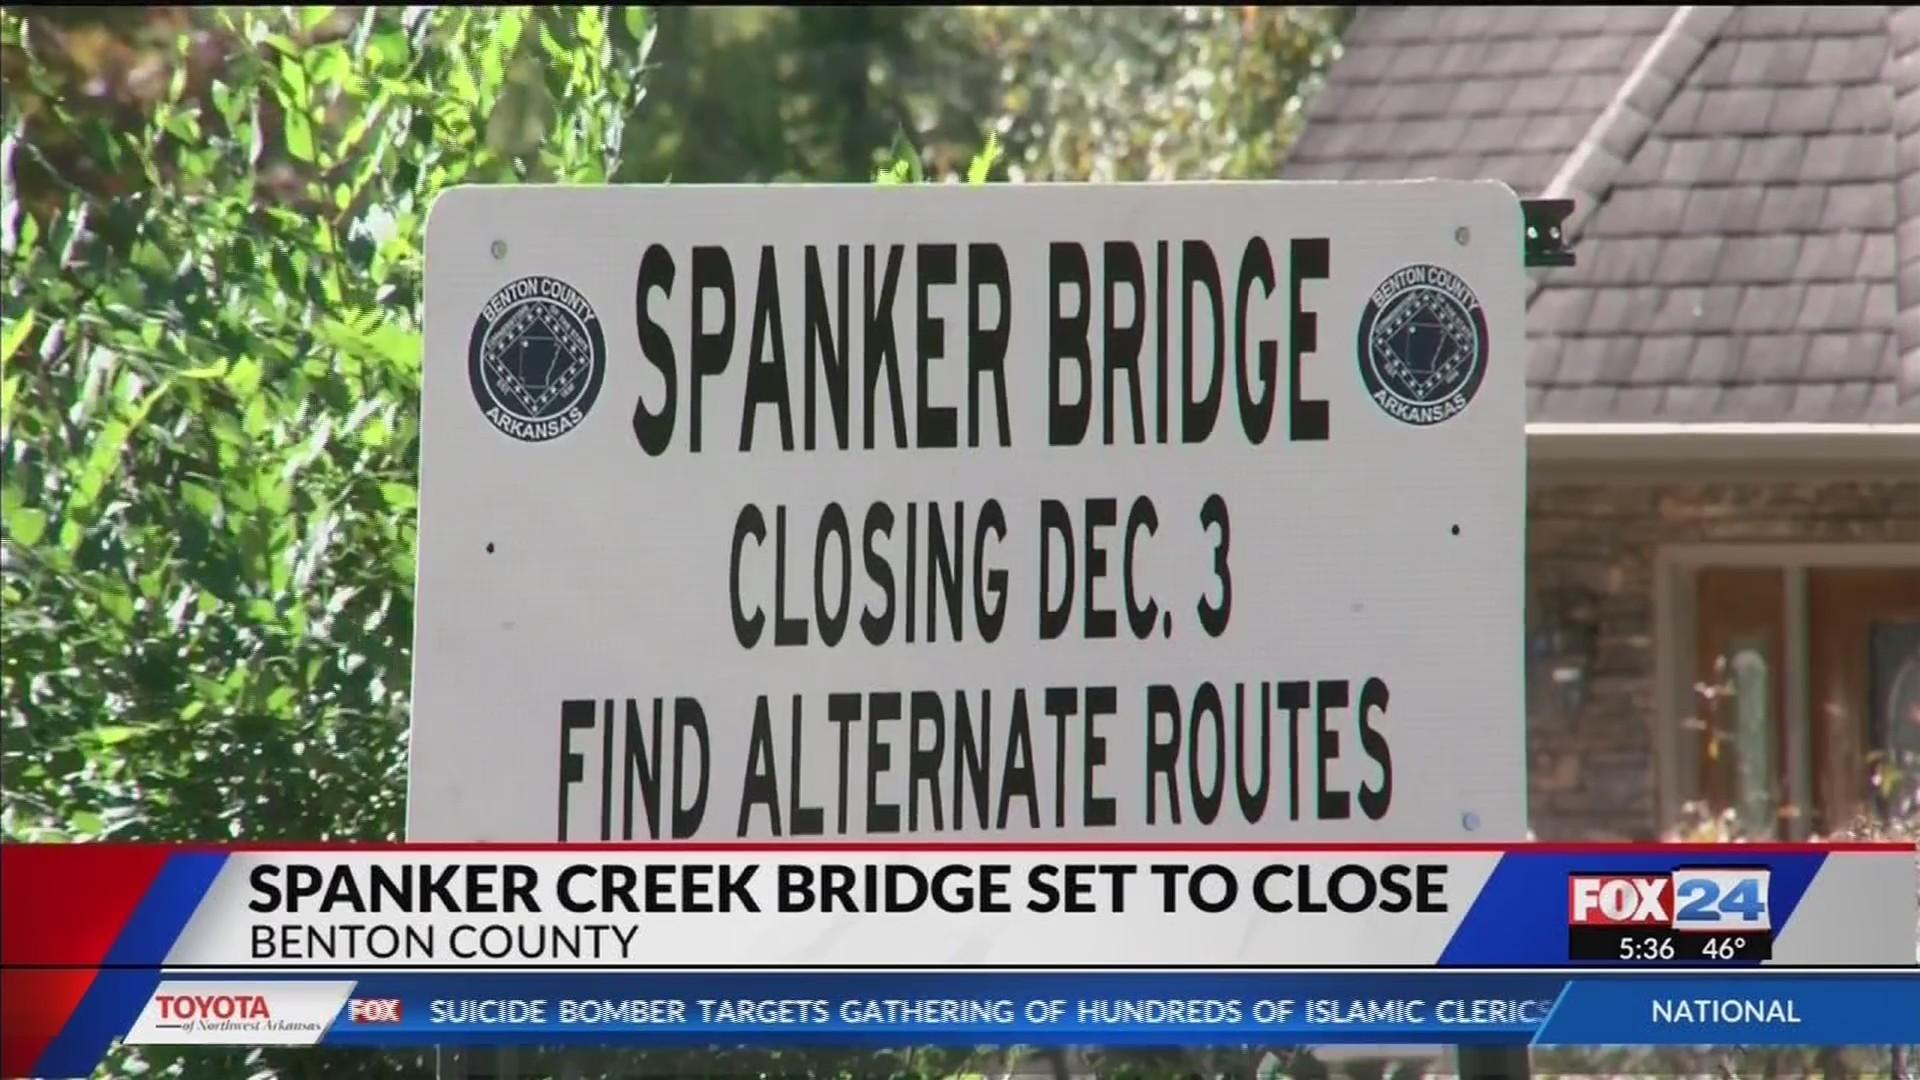 Spanker_Creek_Bridge_to_Be_Completely_Re_0_20181121021555